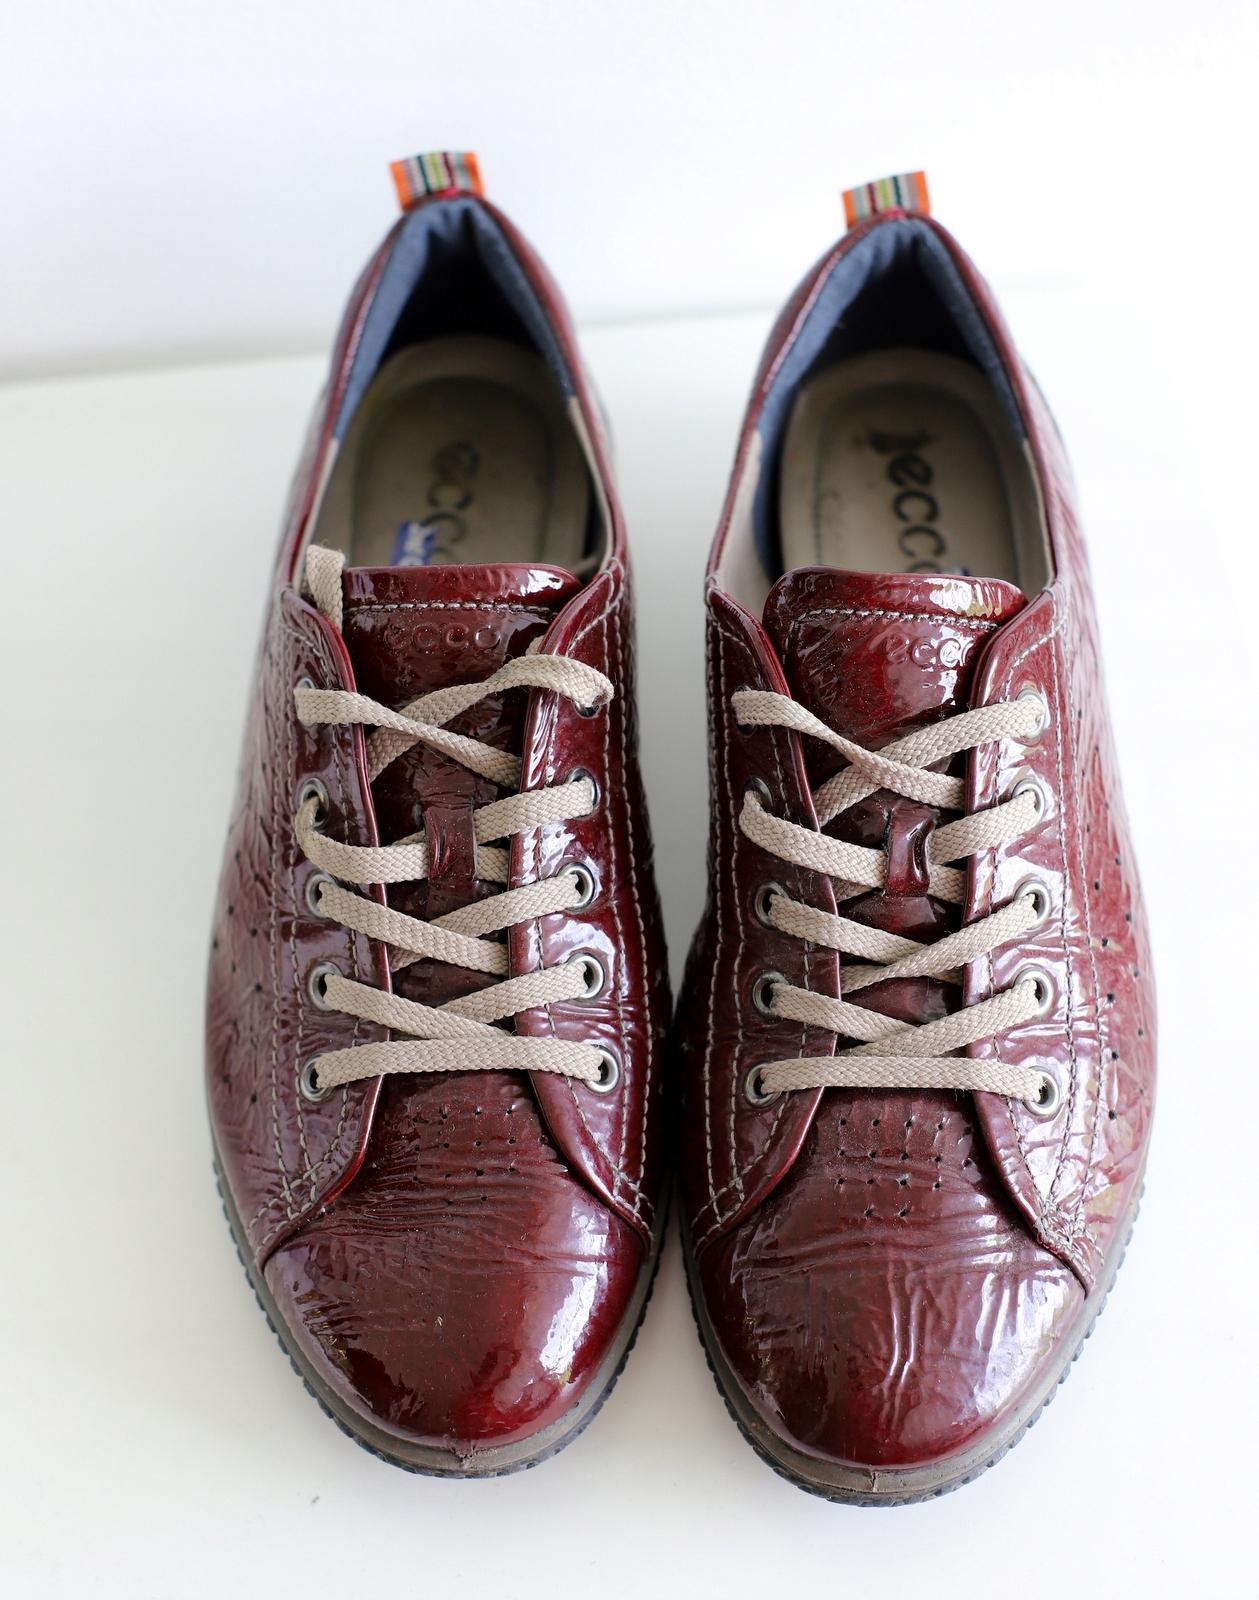 ecco buty lakierki bordowe 41